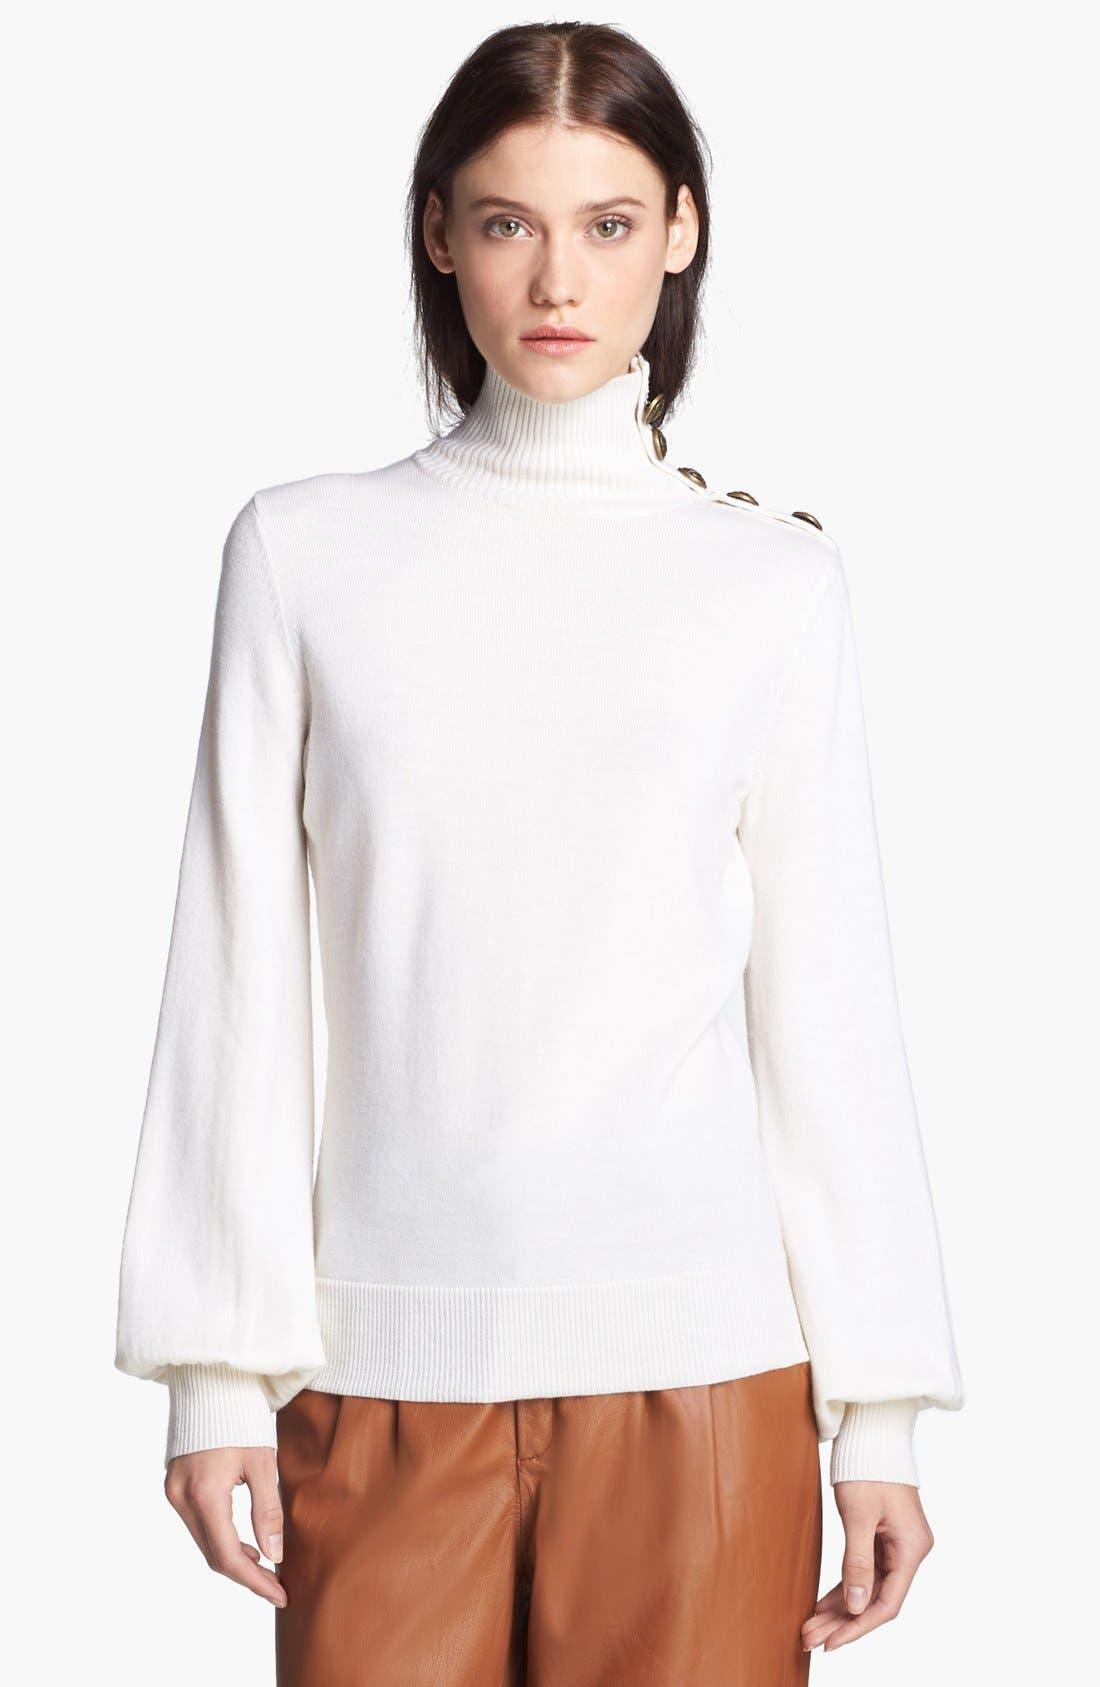 Main Image - Rachel Zoe 'Margo' Turtleneck Sweater